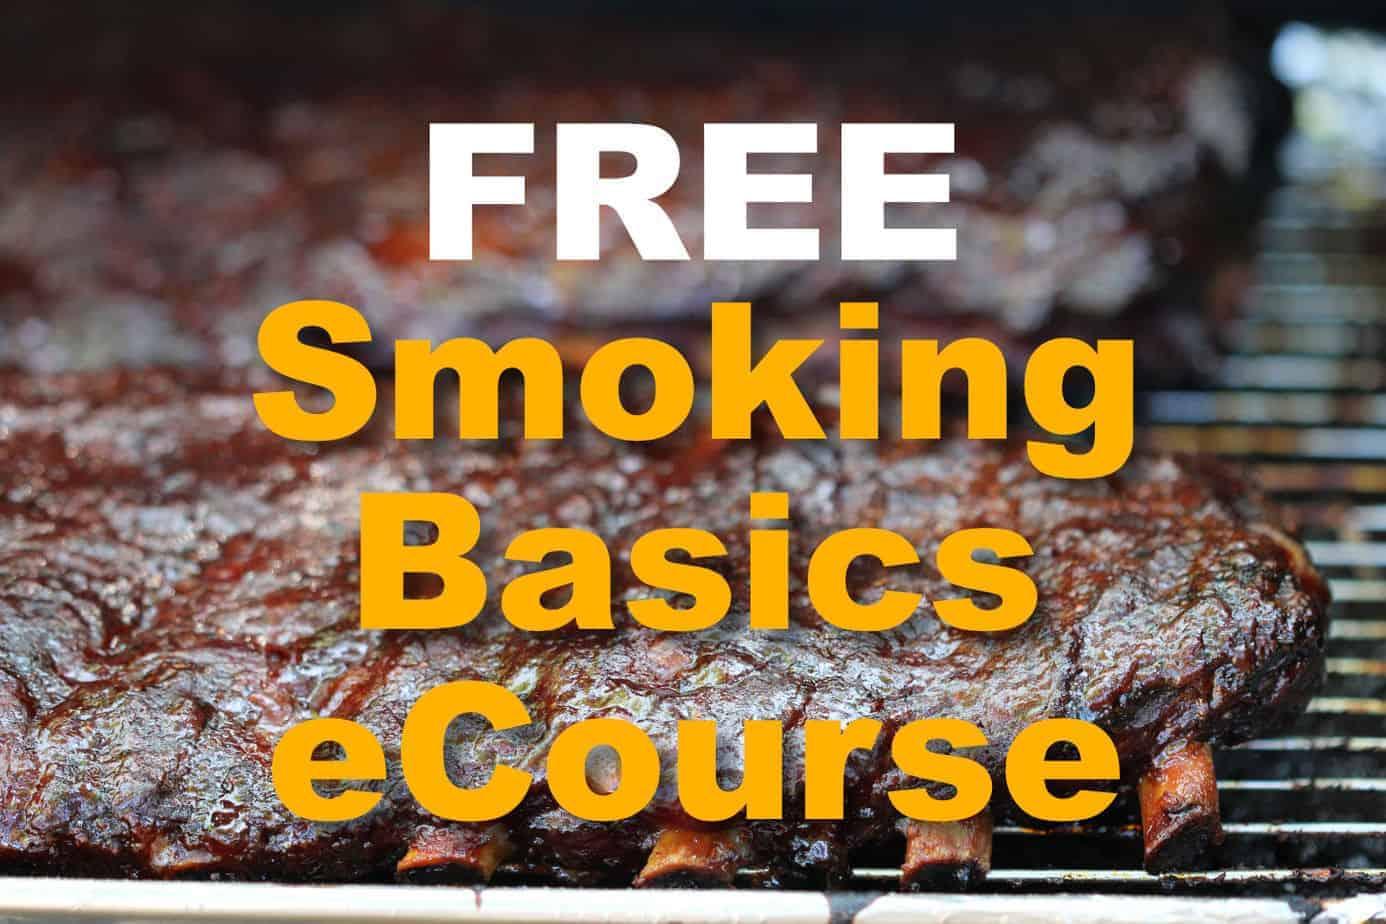 smoking basics ecourse featured 2